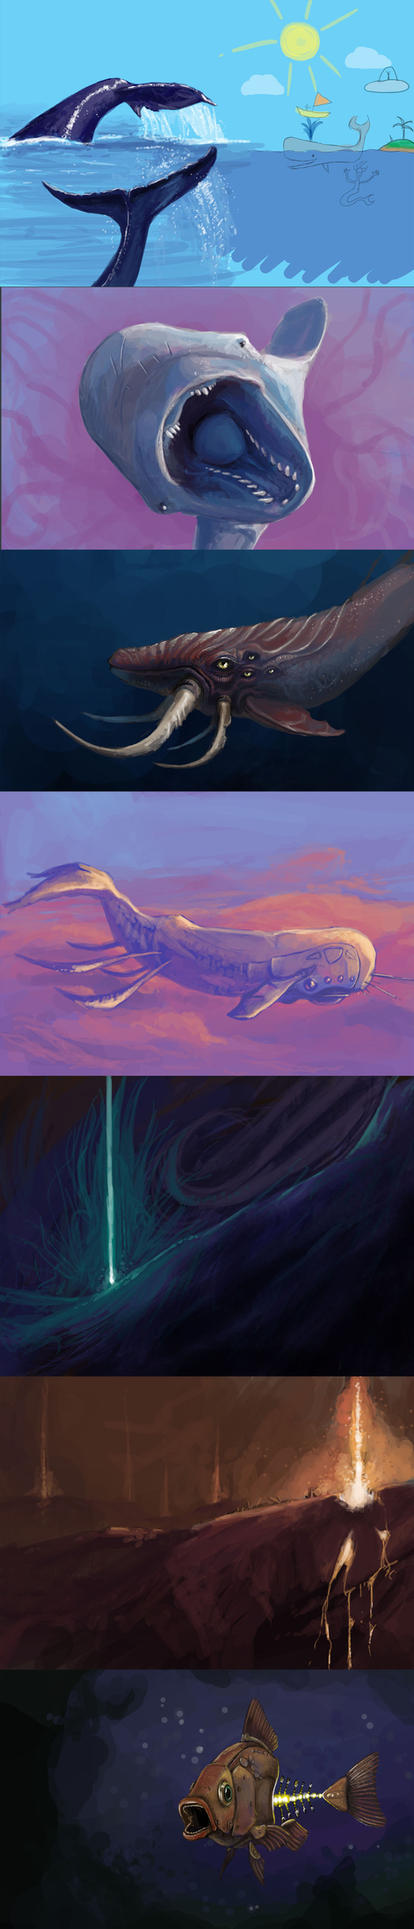 Random Whales And Stuff by kalliikak